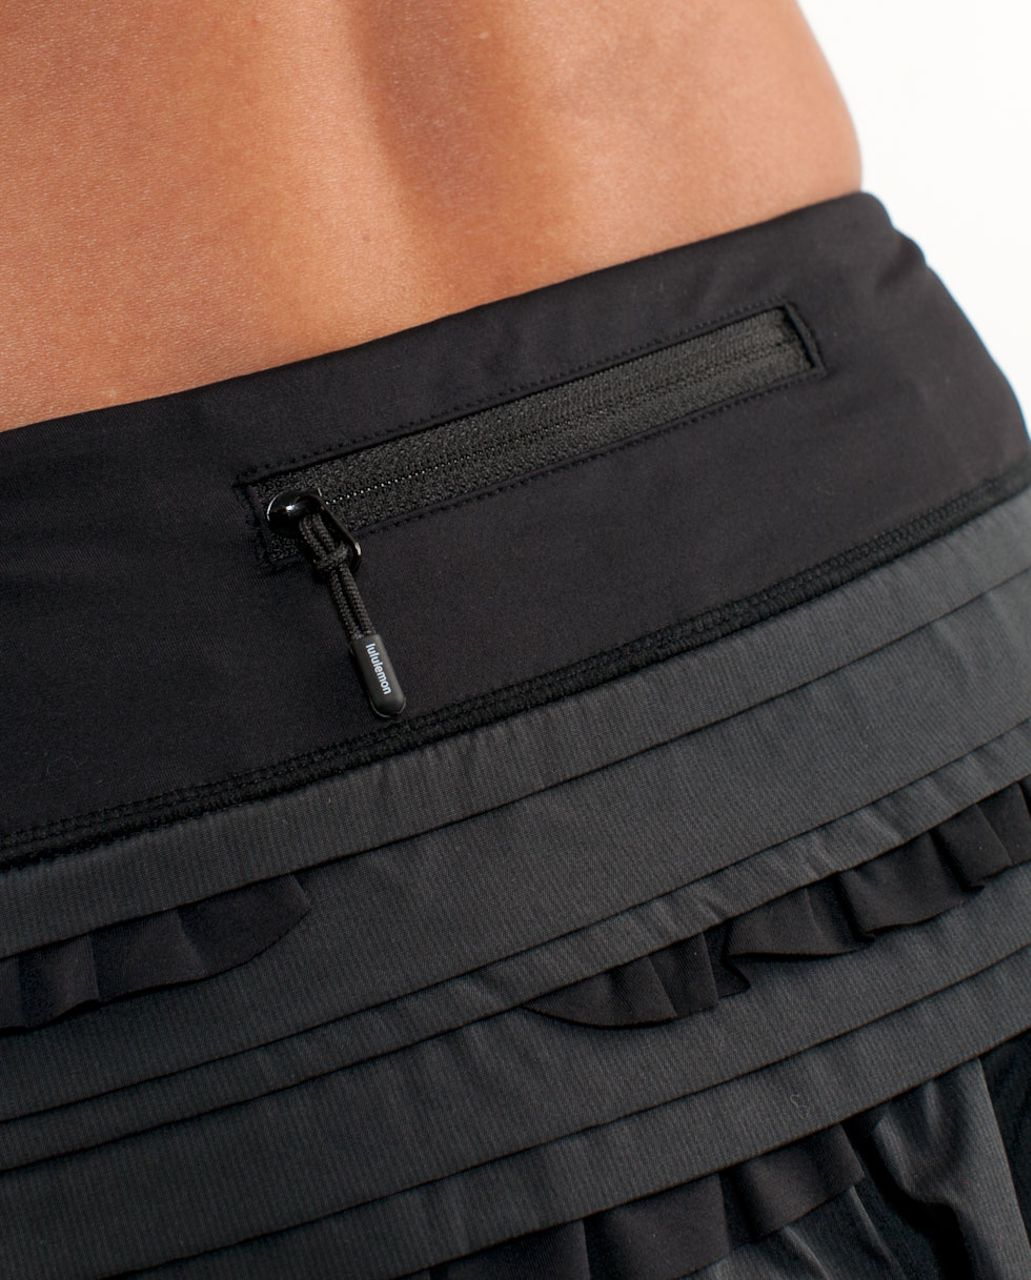 Lululemon Run:  Back On Track Skirt - Black